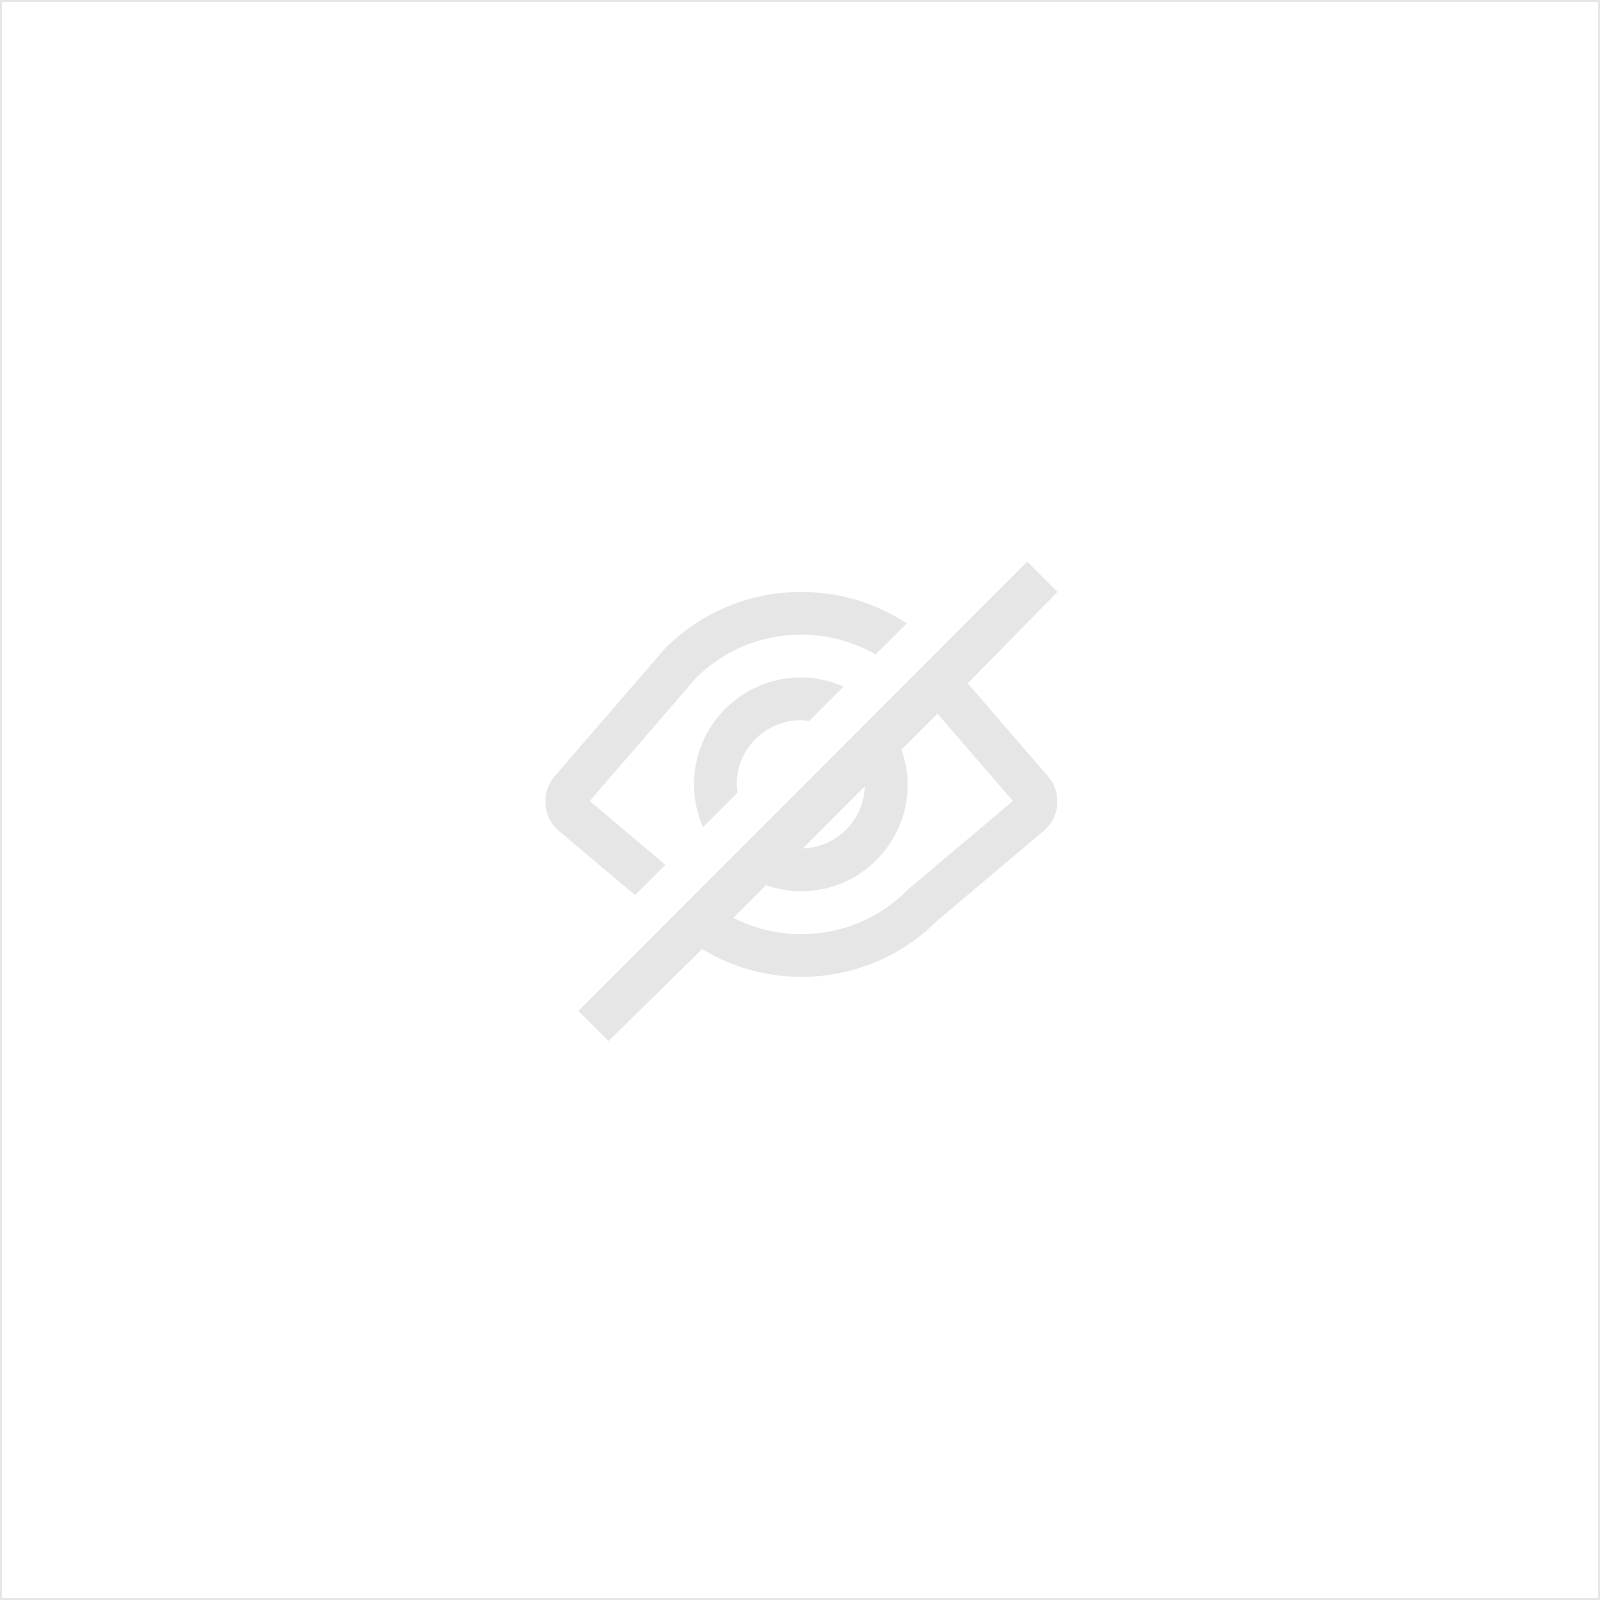 MECH-MATE VERSCHUIFBAAR KRIK-PLATFORM VOOR MECH-MATE SMEERPUT